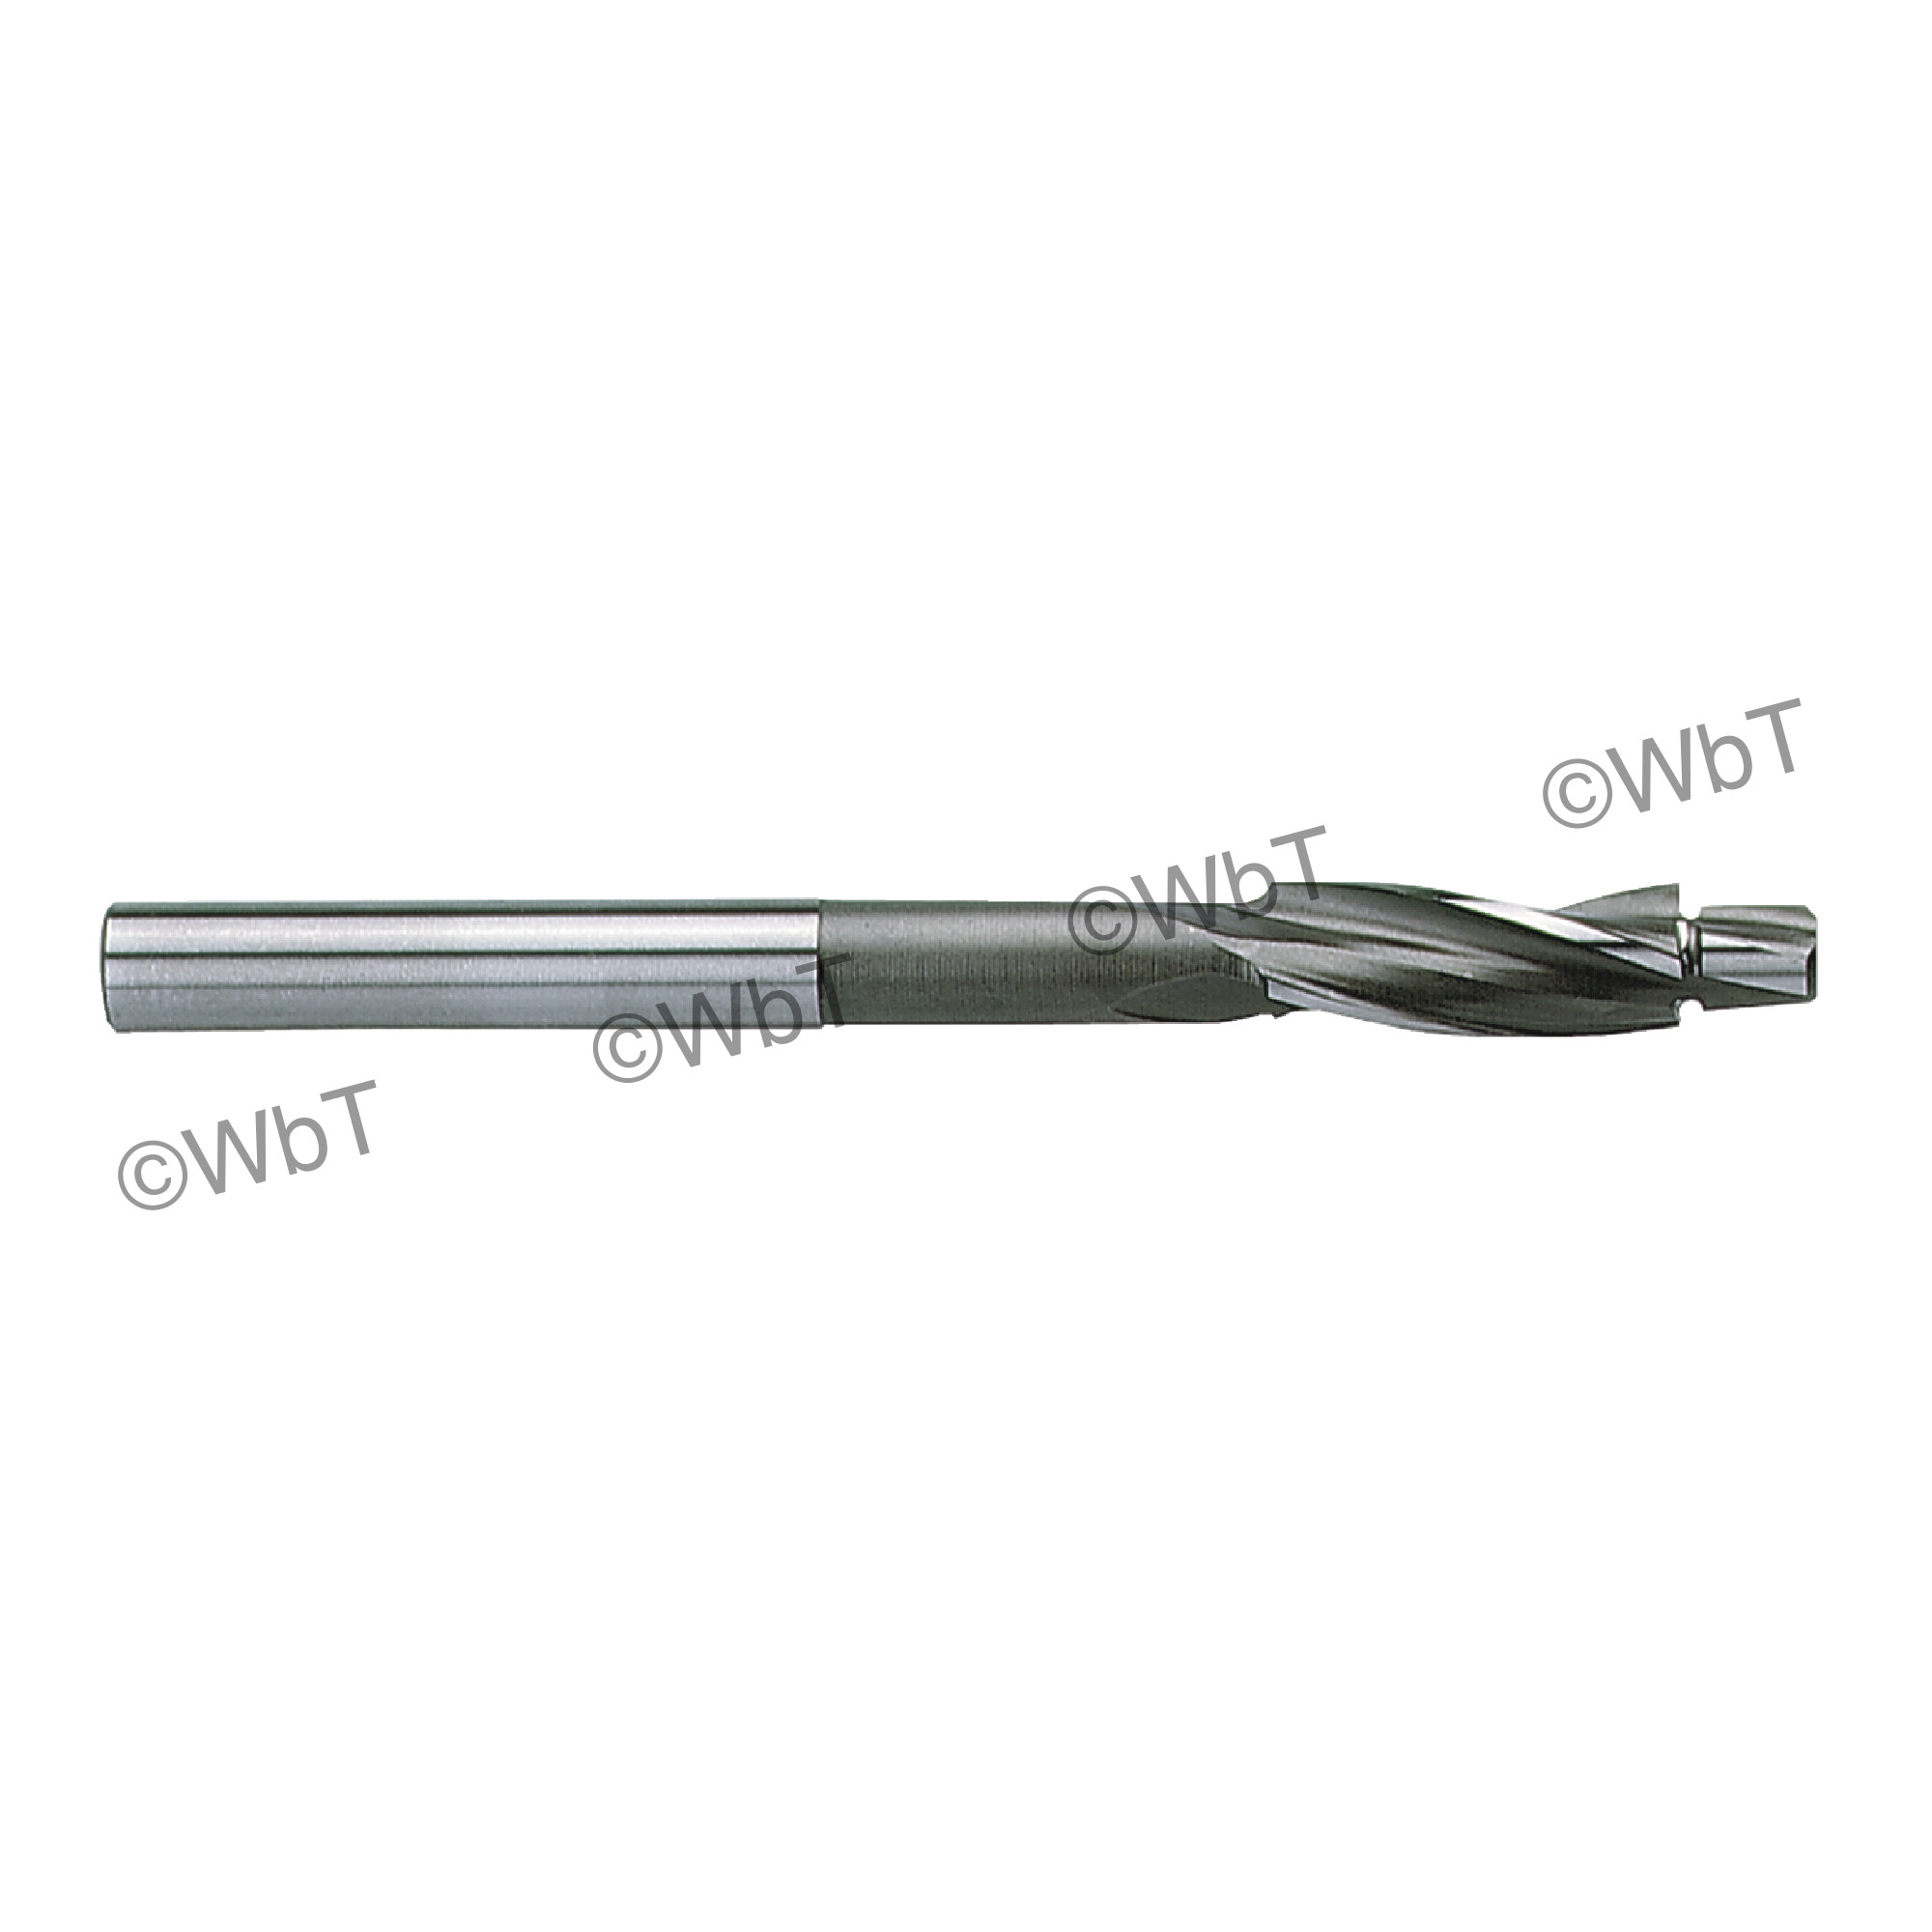 3 Flute High Speed Steel Solid Cap Screw Counterbore